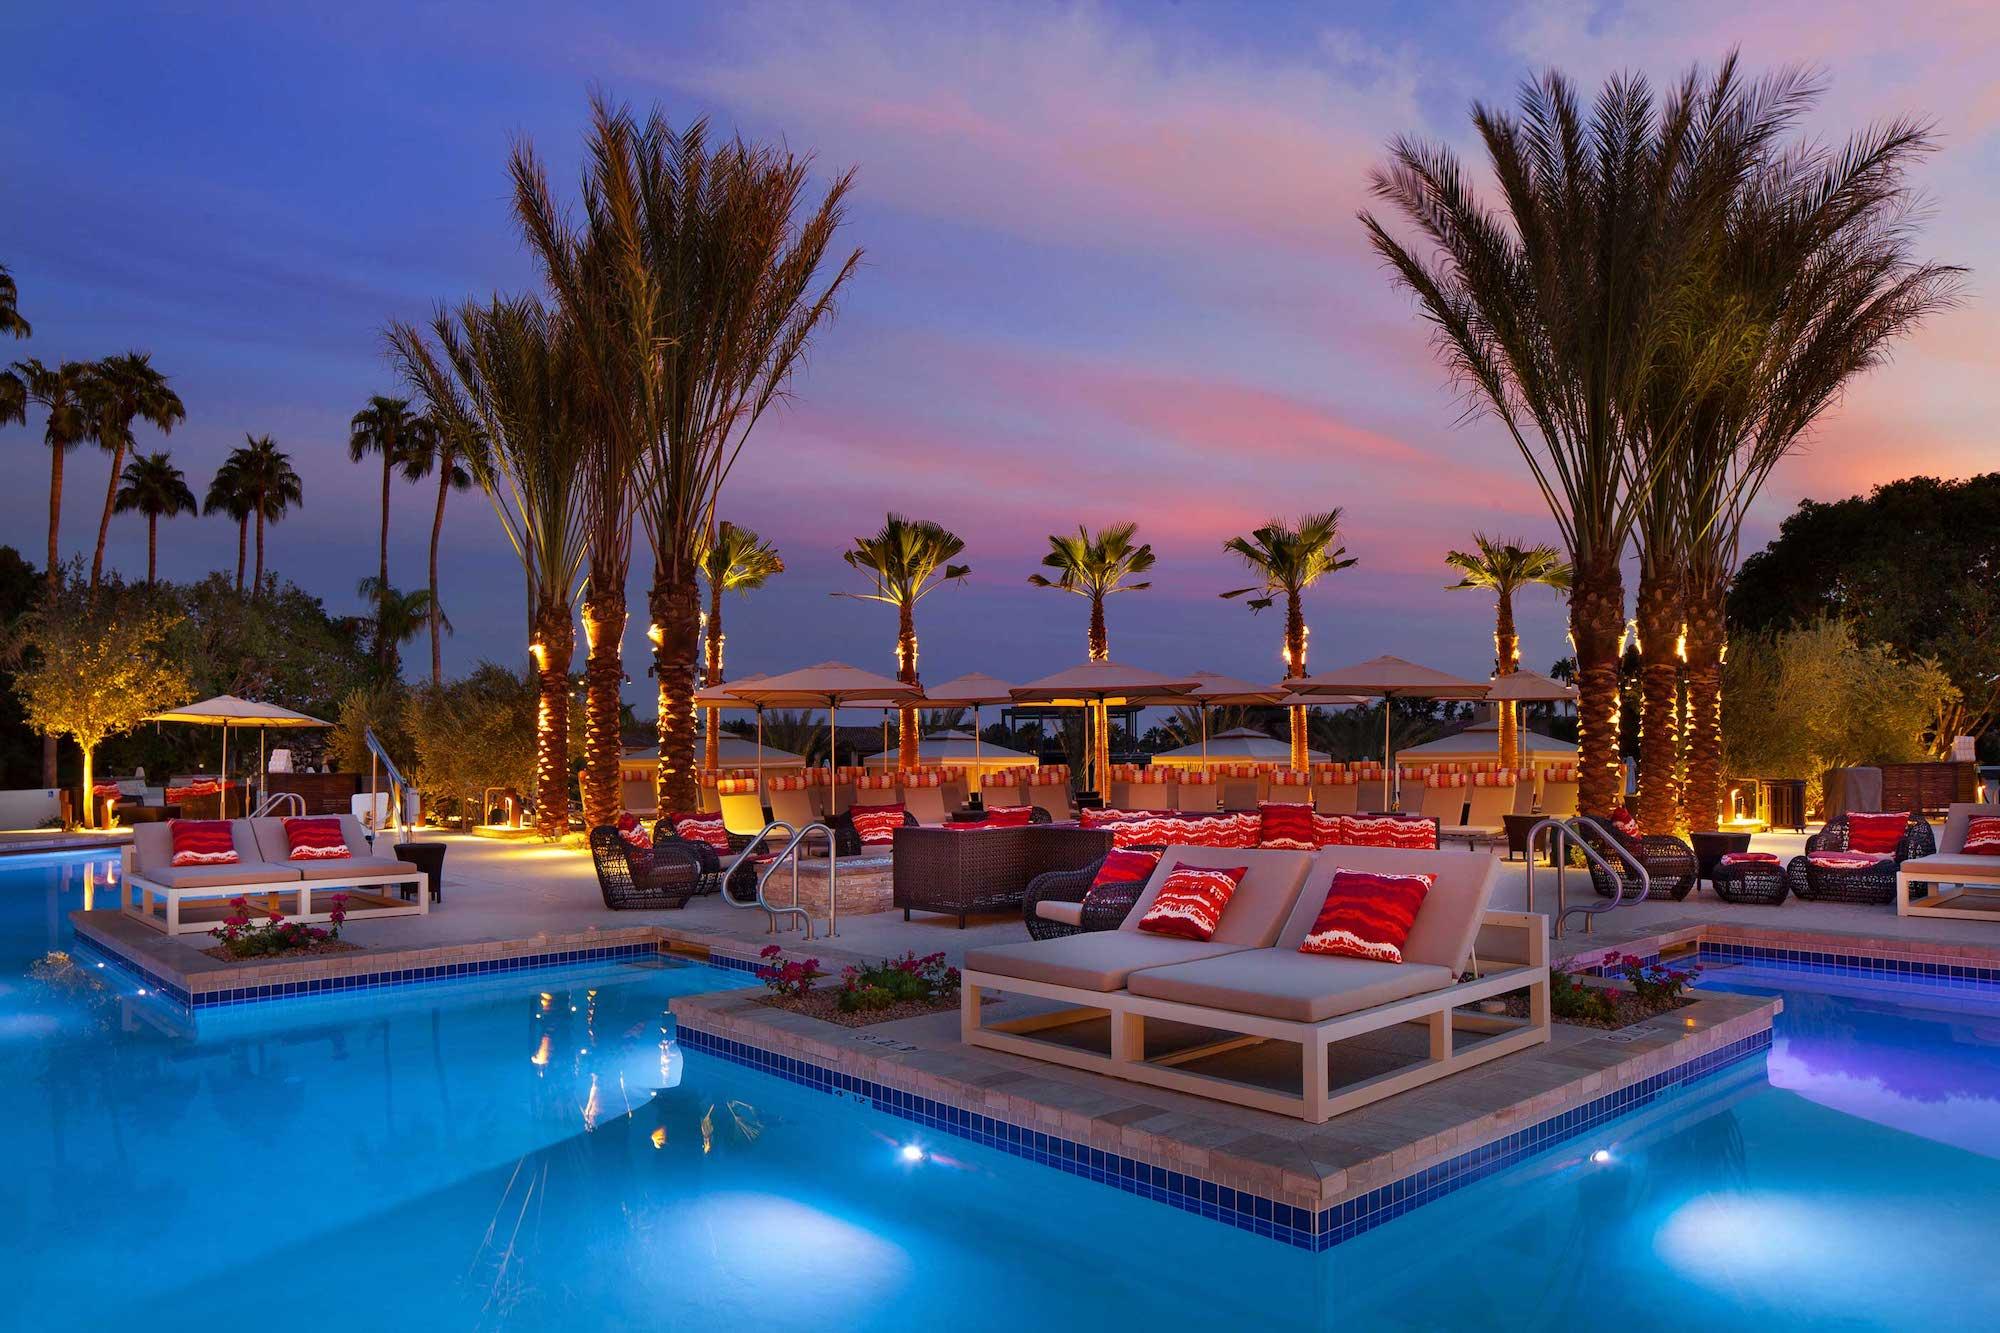 The Phoenician Pool